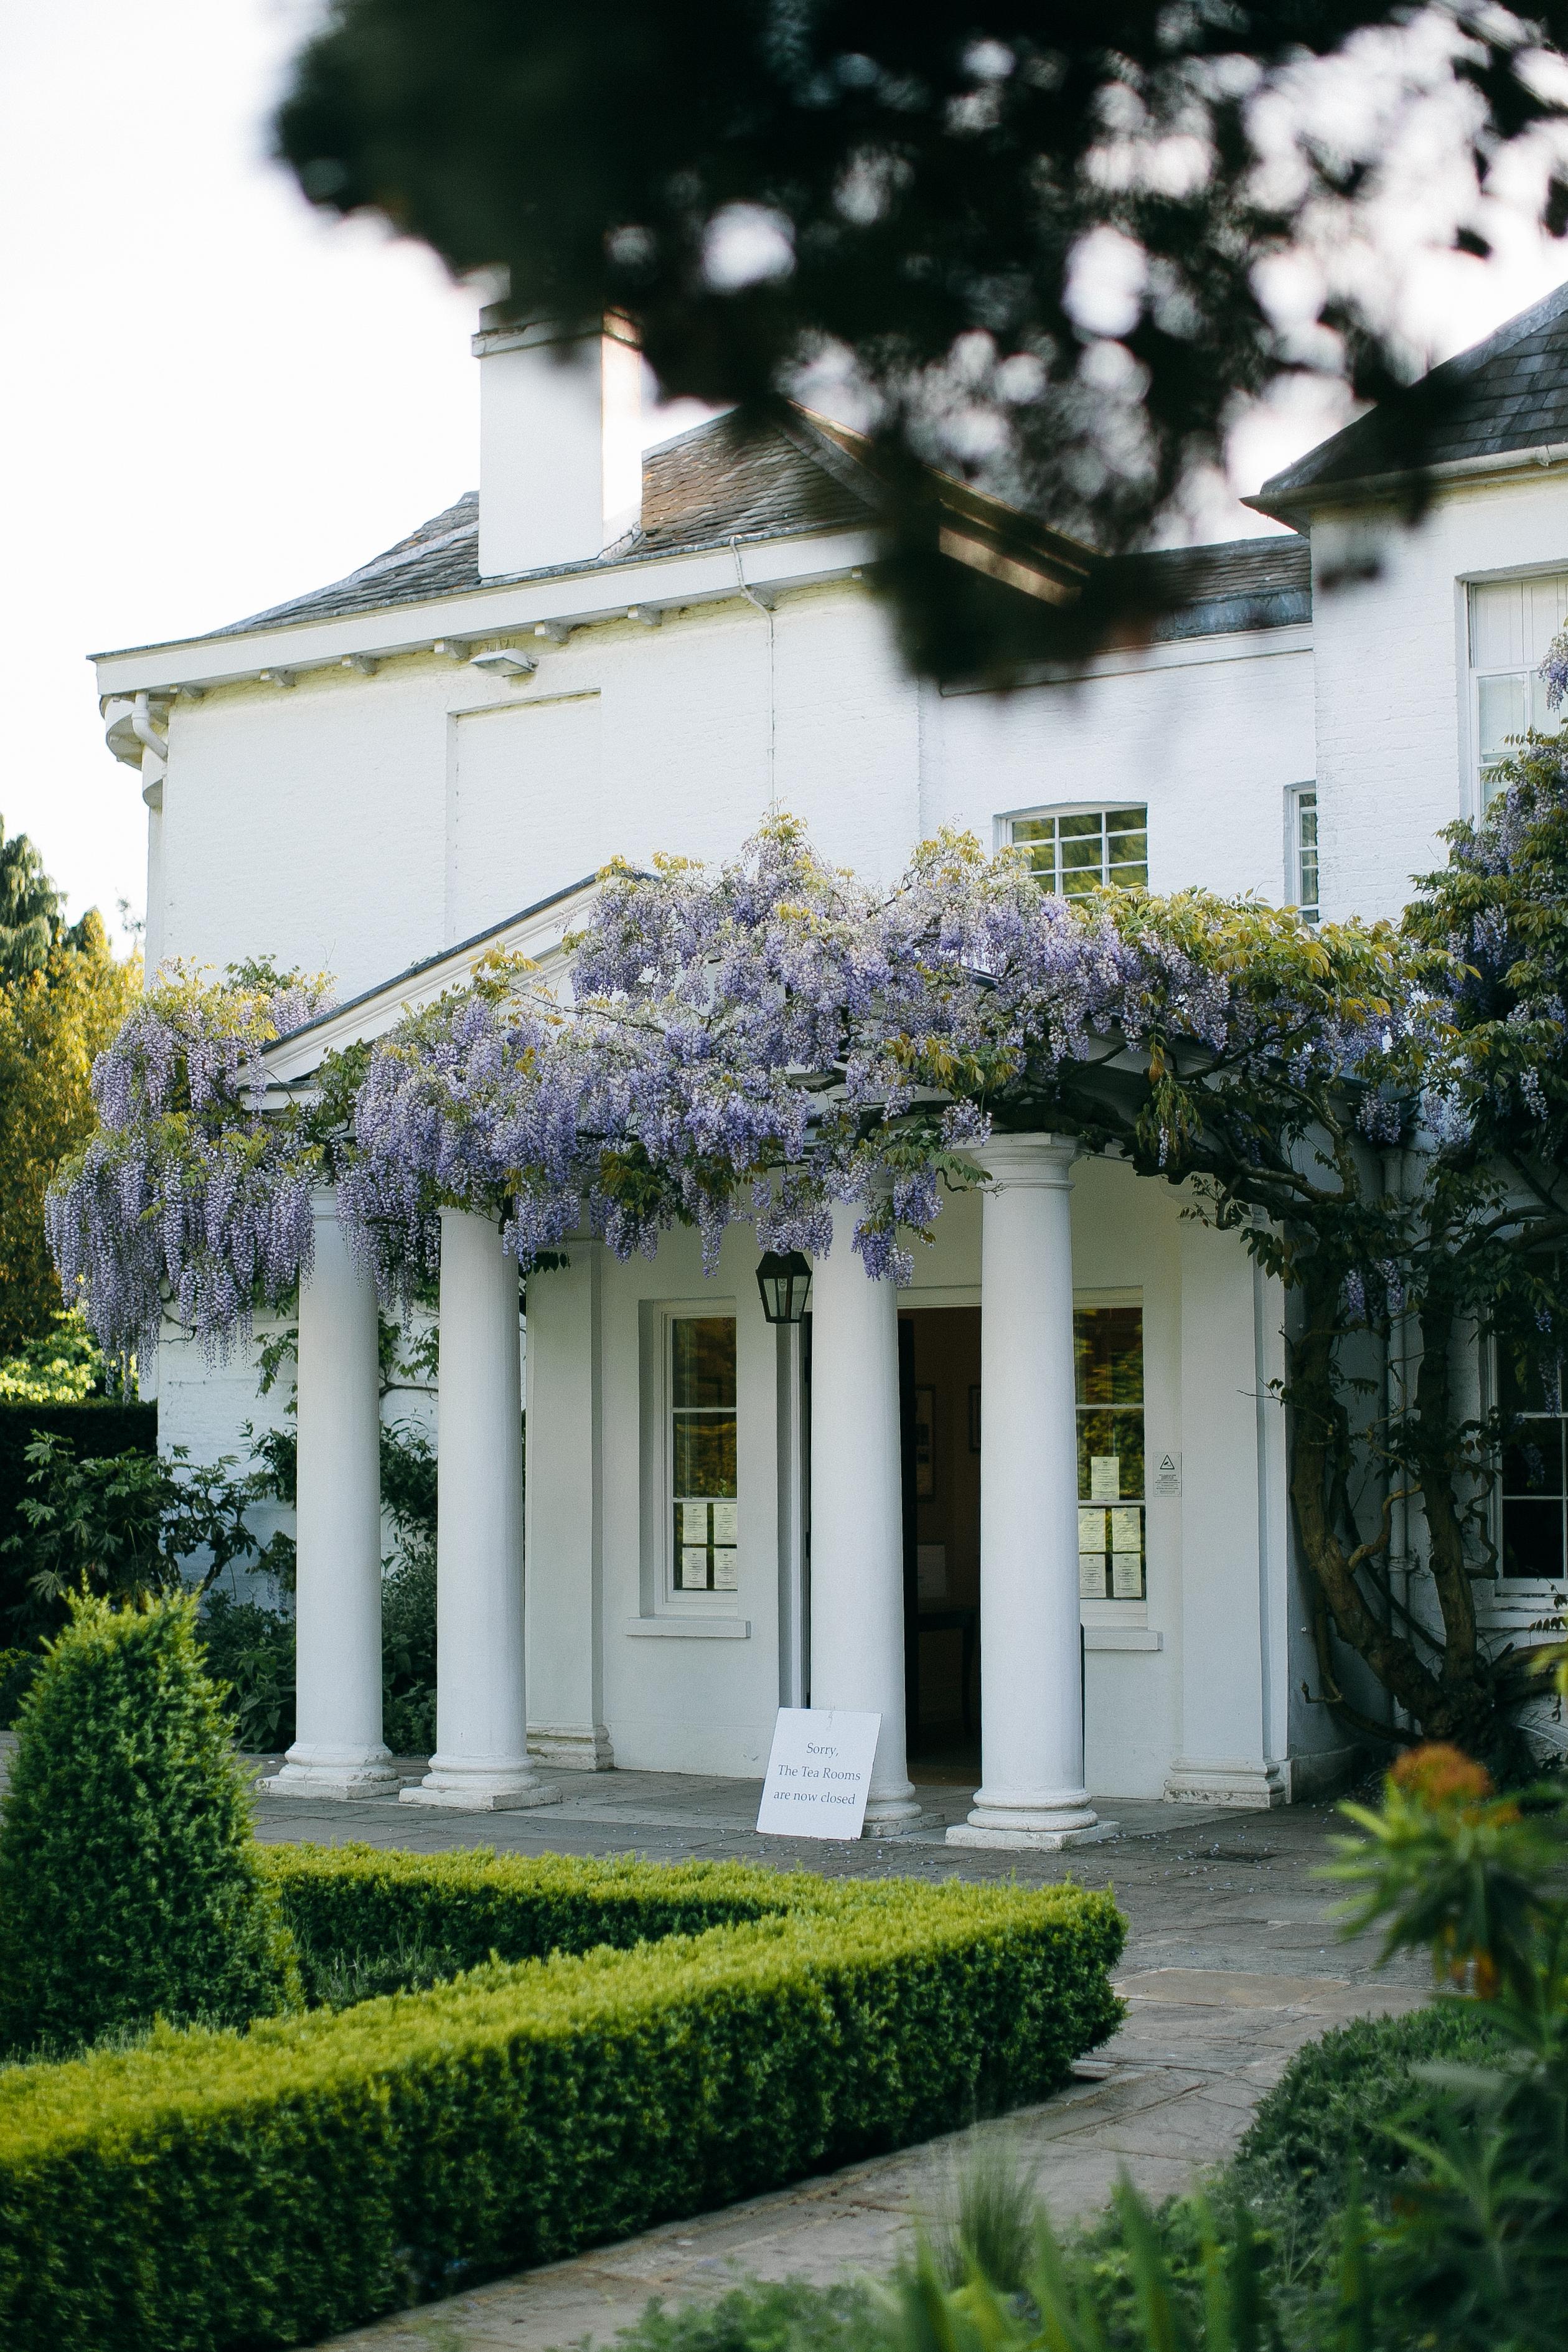 Purple Flowers and White Concrete Building